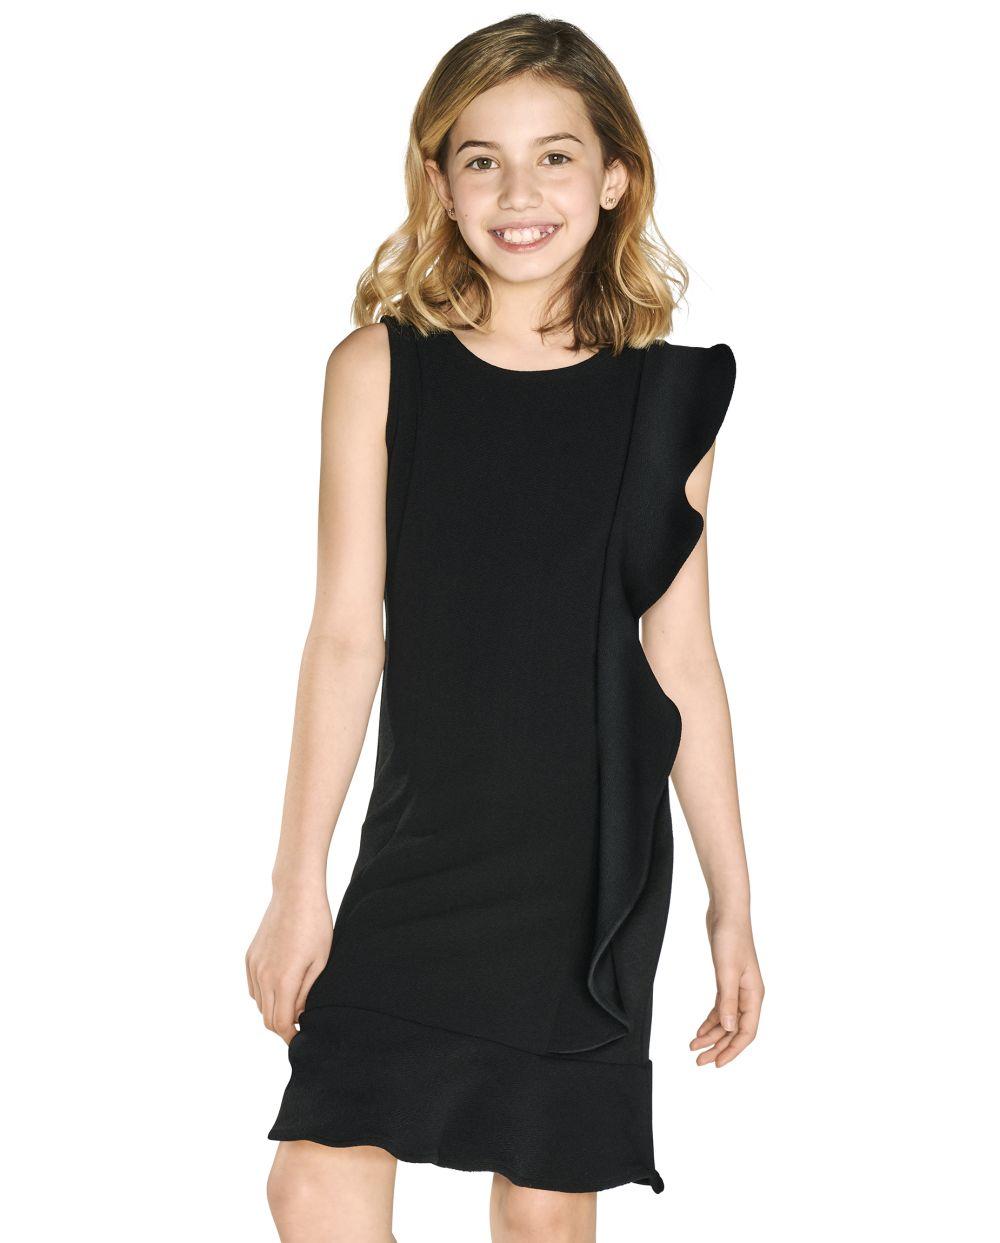 Girls Ruffle Stretch Jacquard Dress - Black